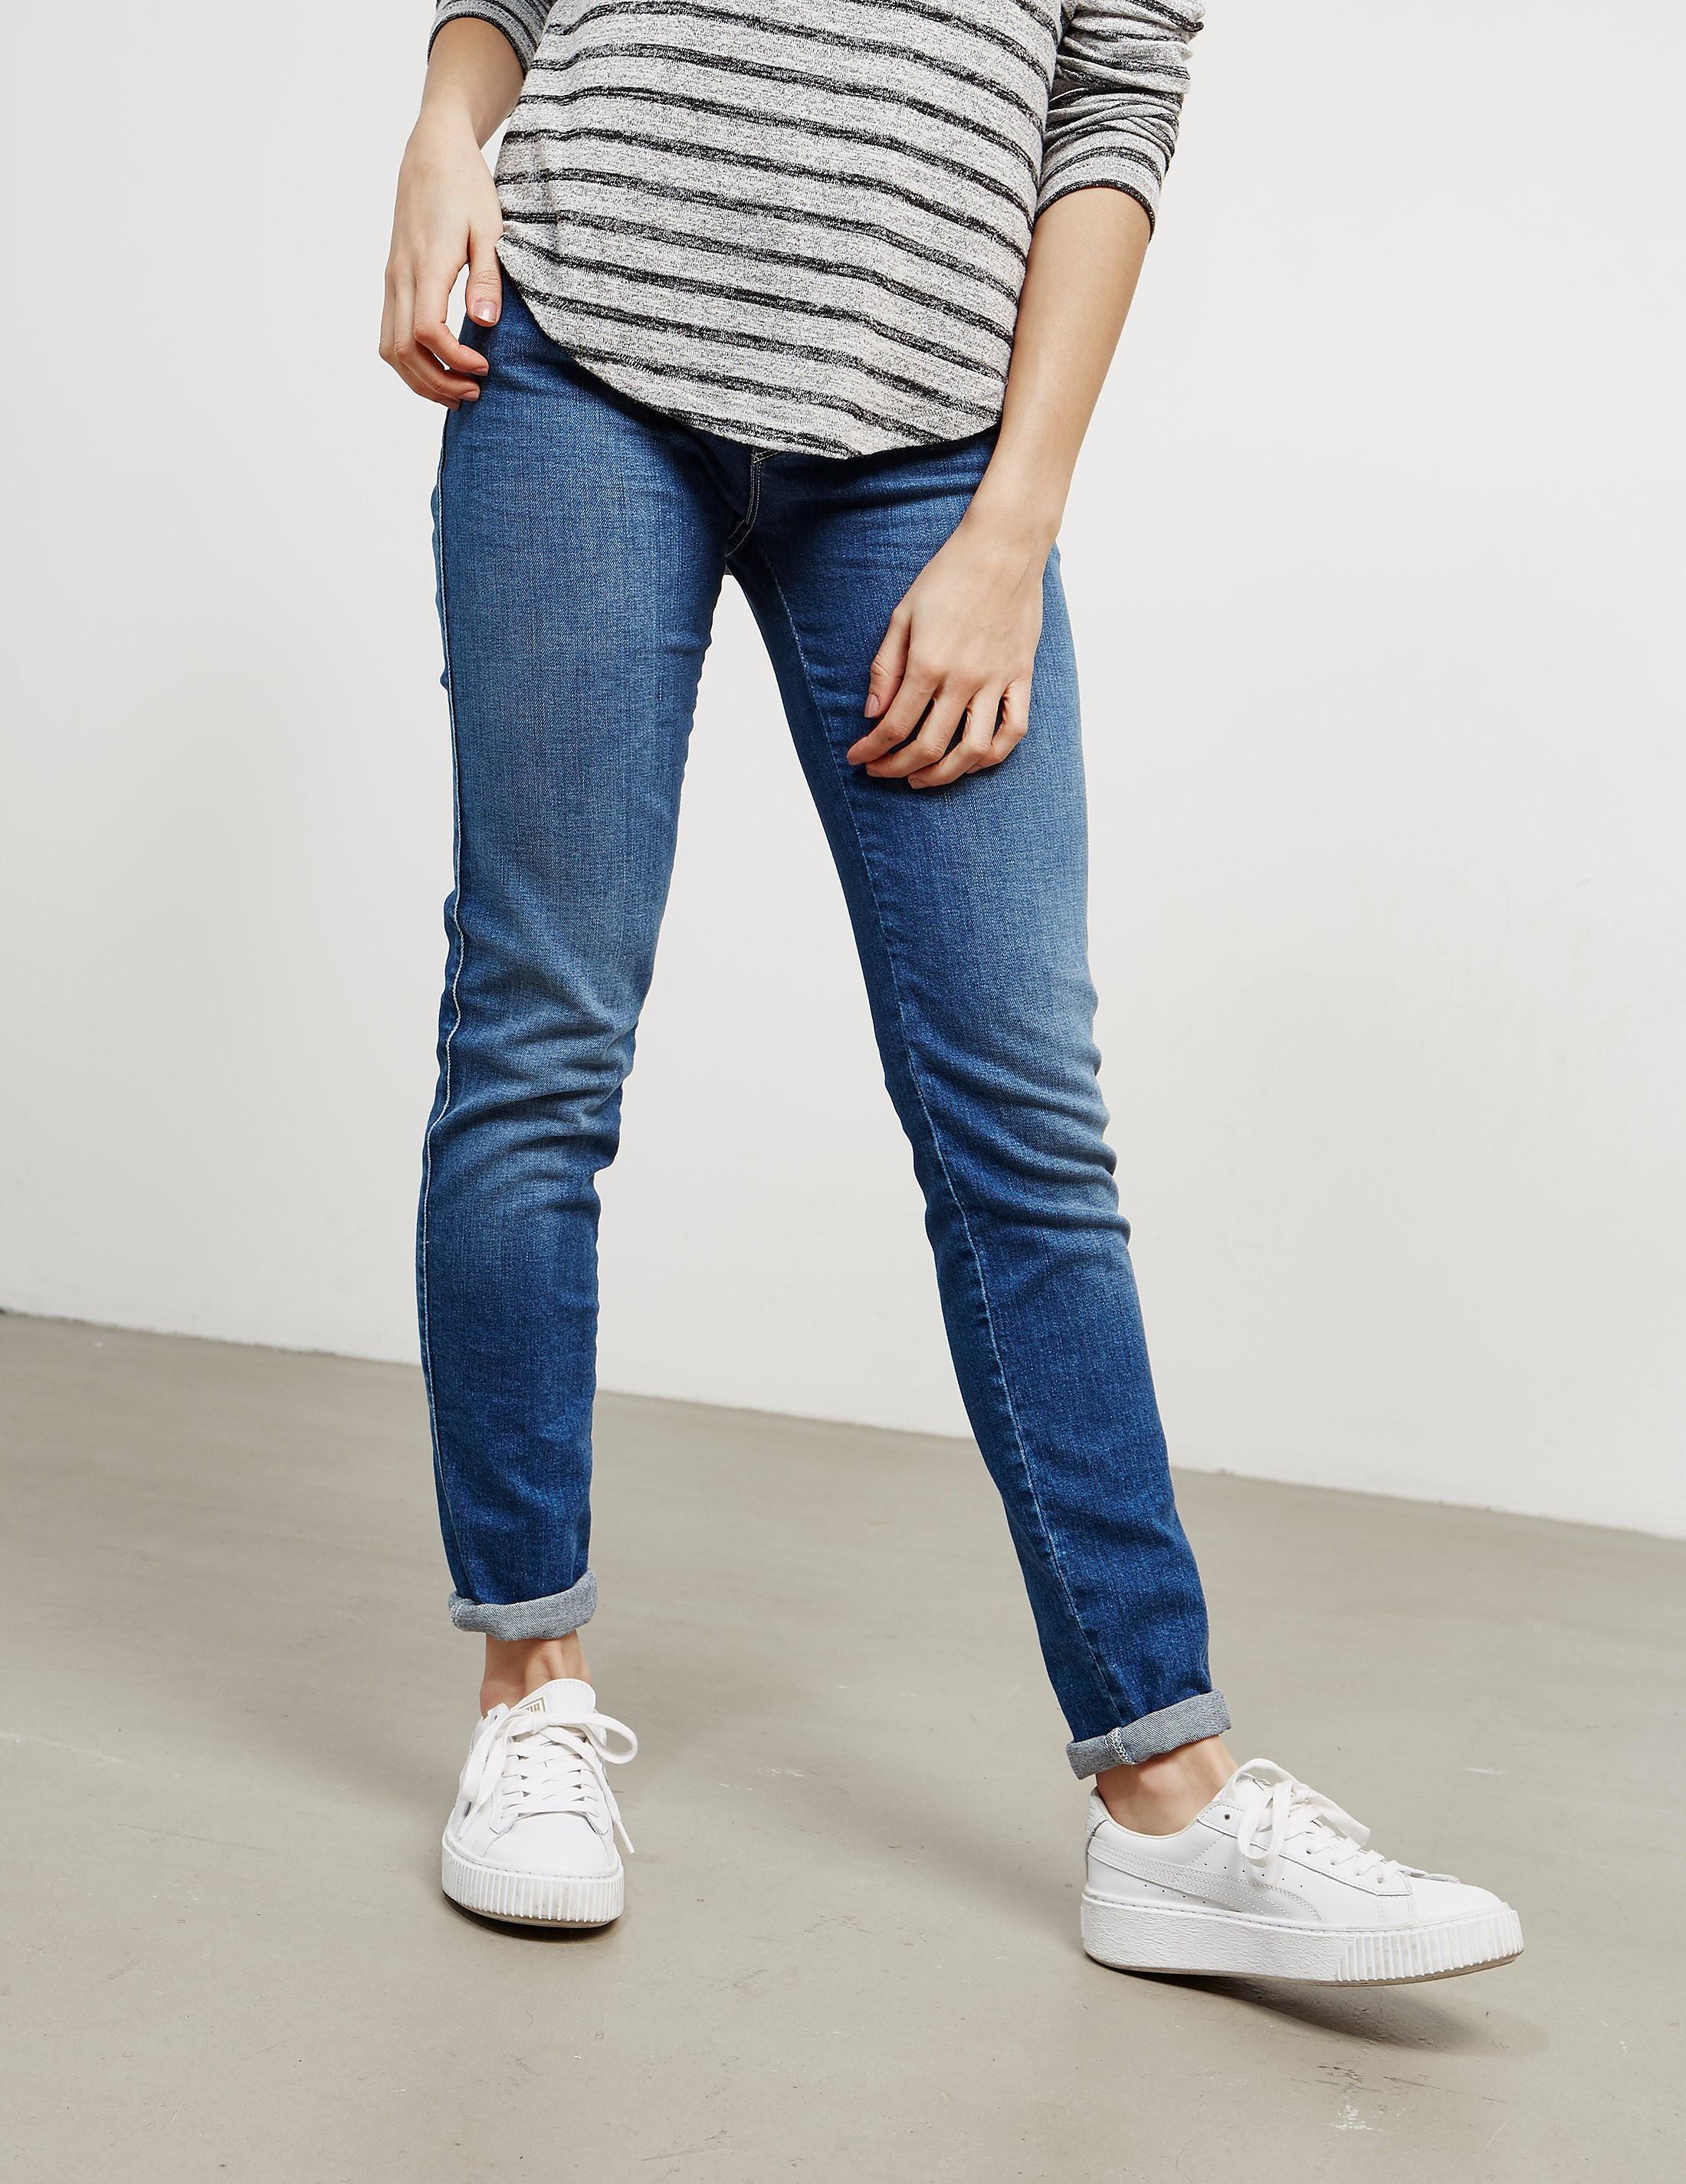 Emporio Armani J28 5 Pocket Jeans - Online Exclusive